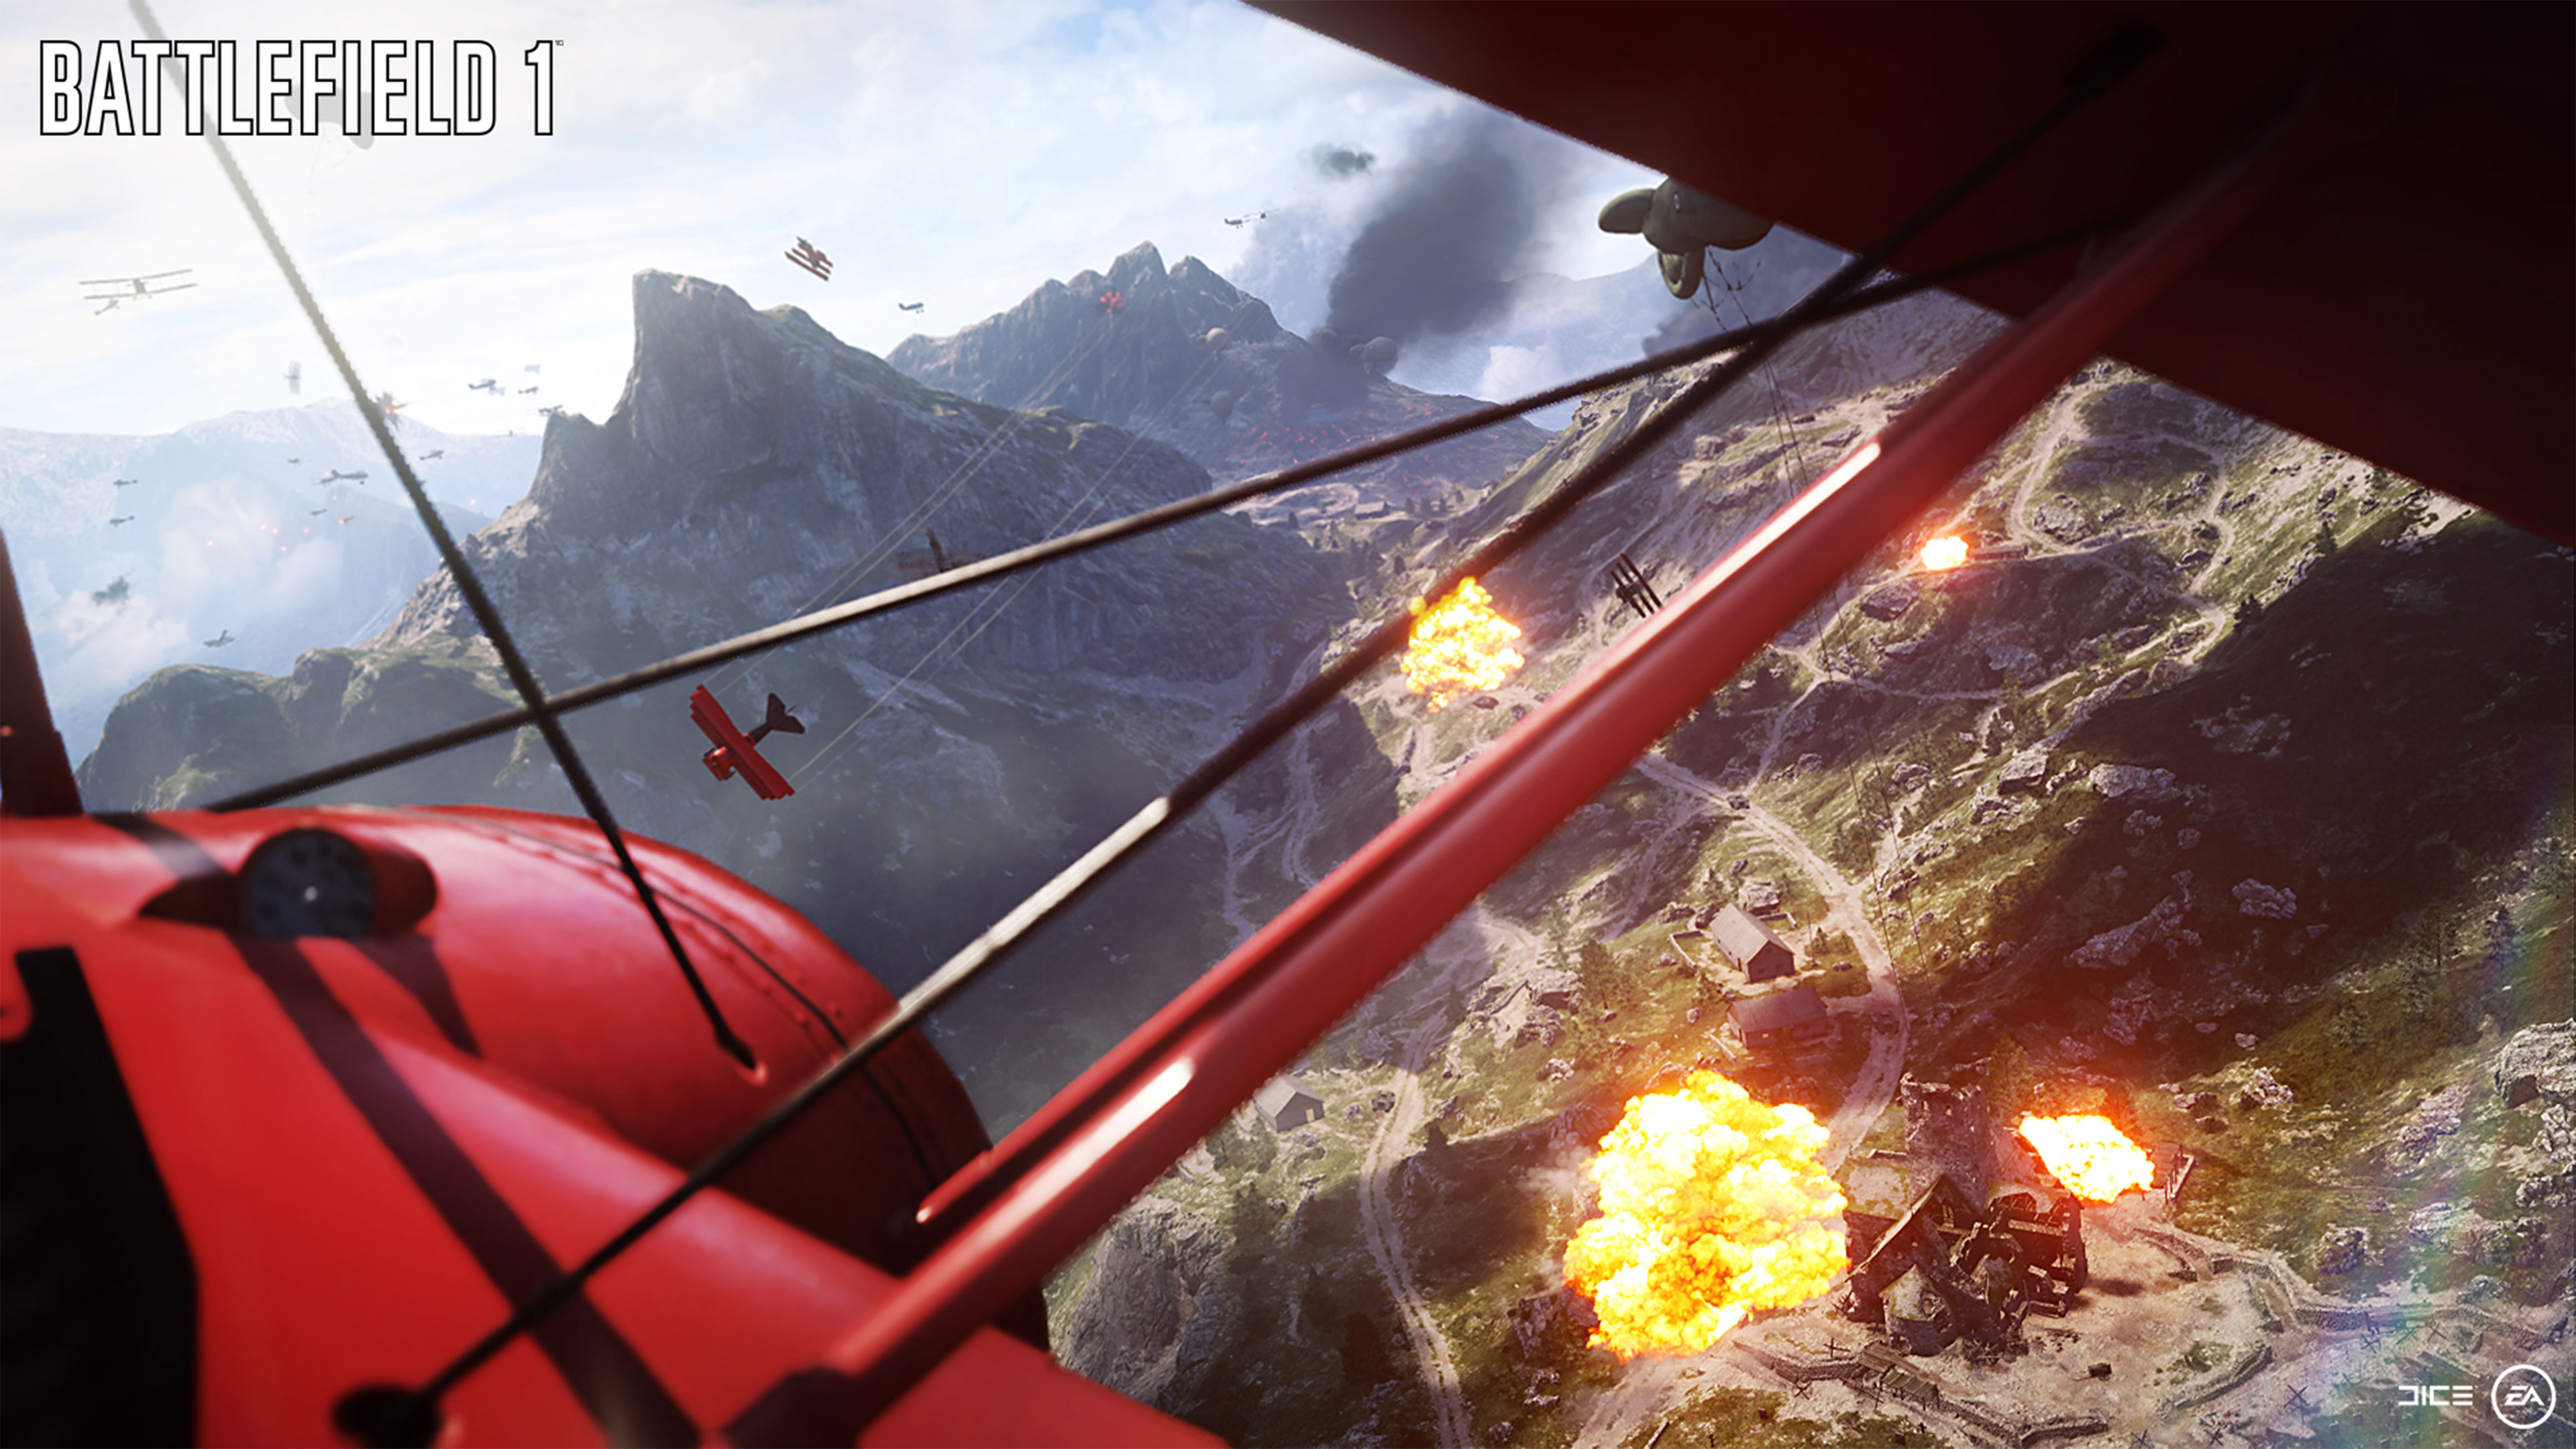 Battlefield 1 4K Wallpaper 3840x2160